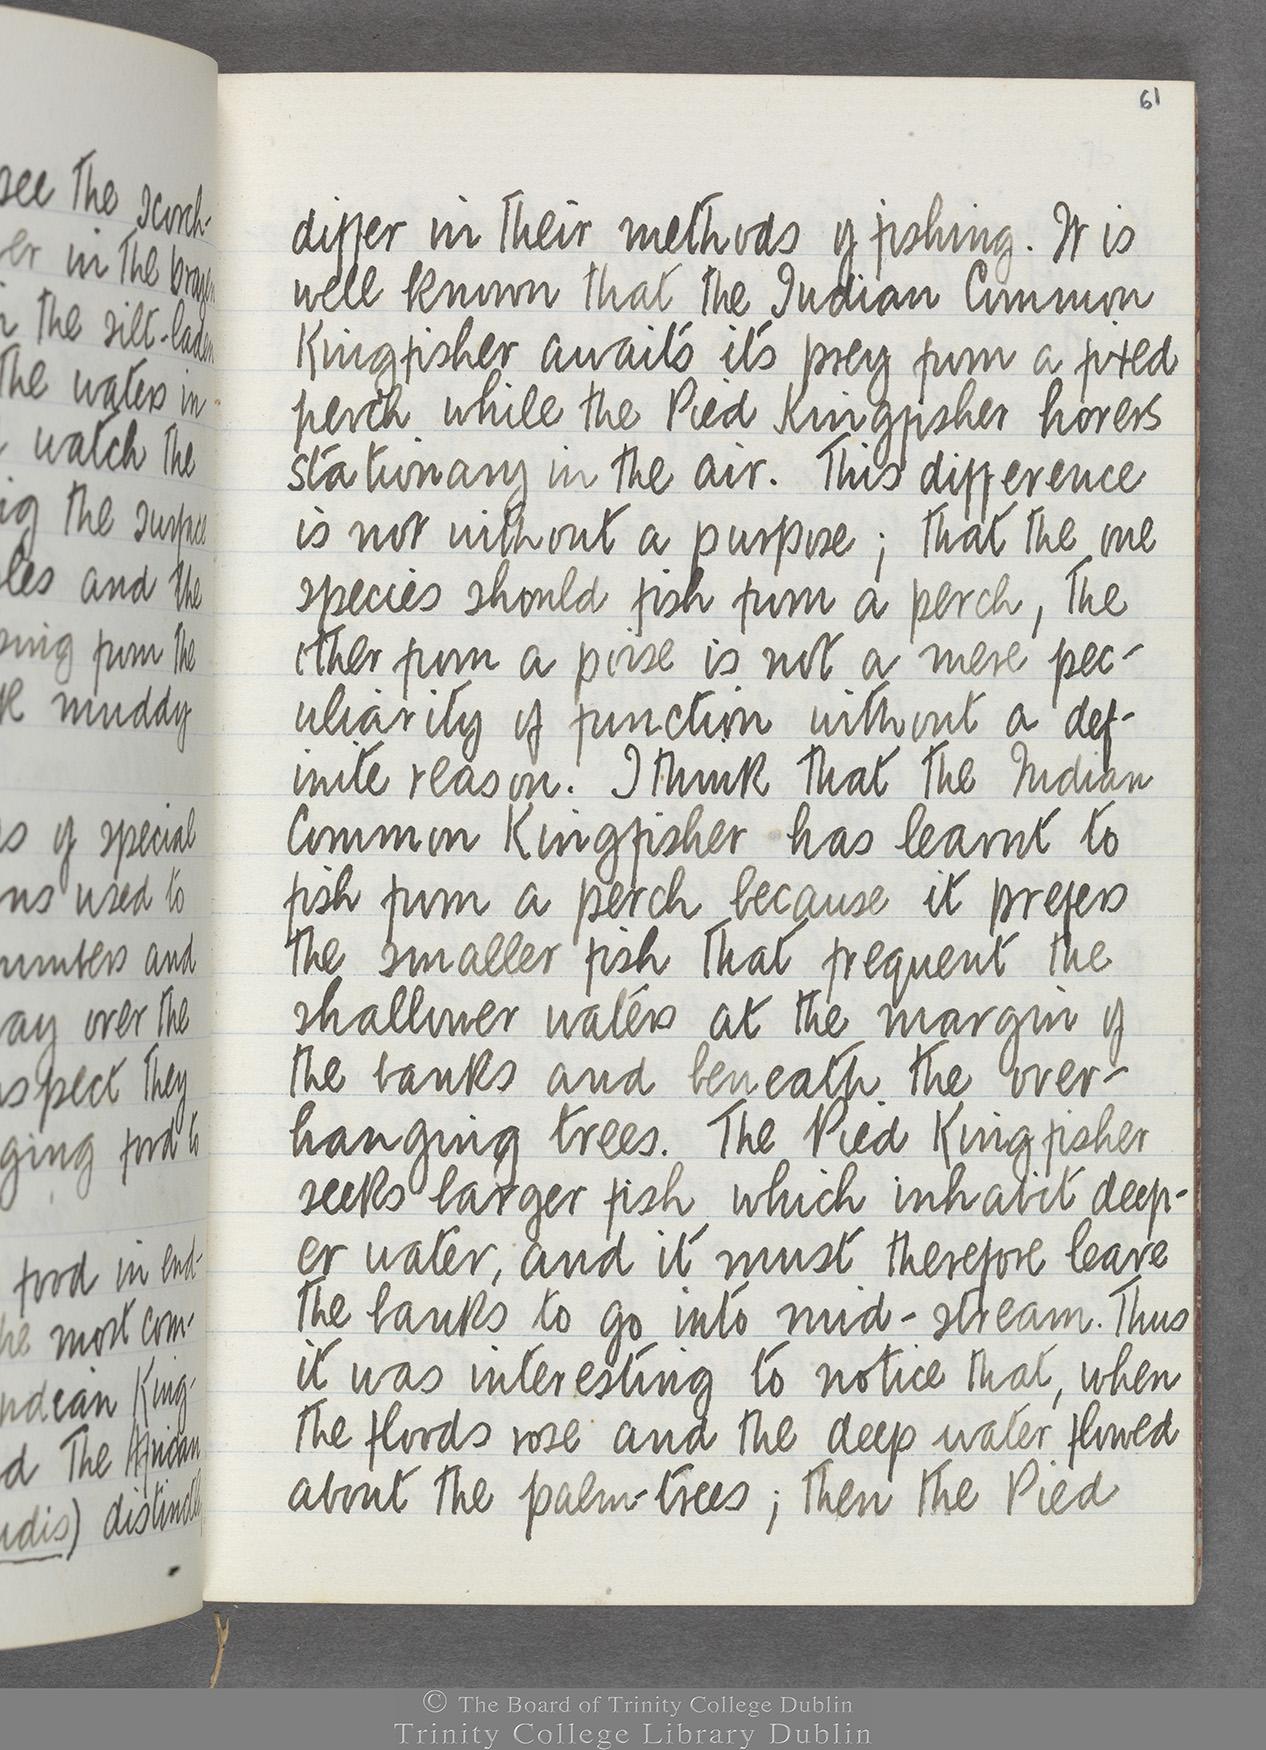 TCD MS 10516 folio 61 recto